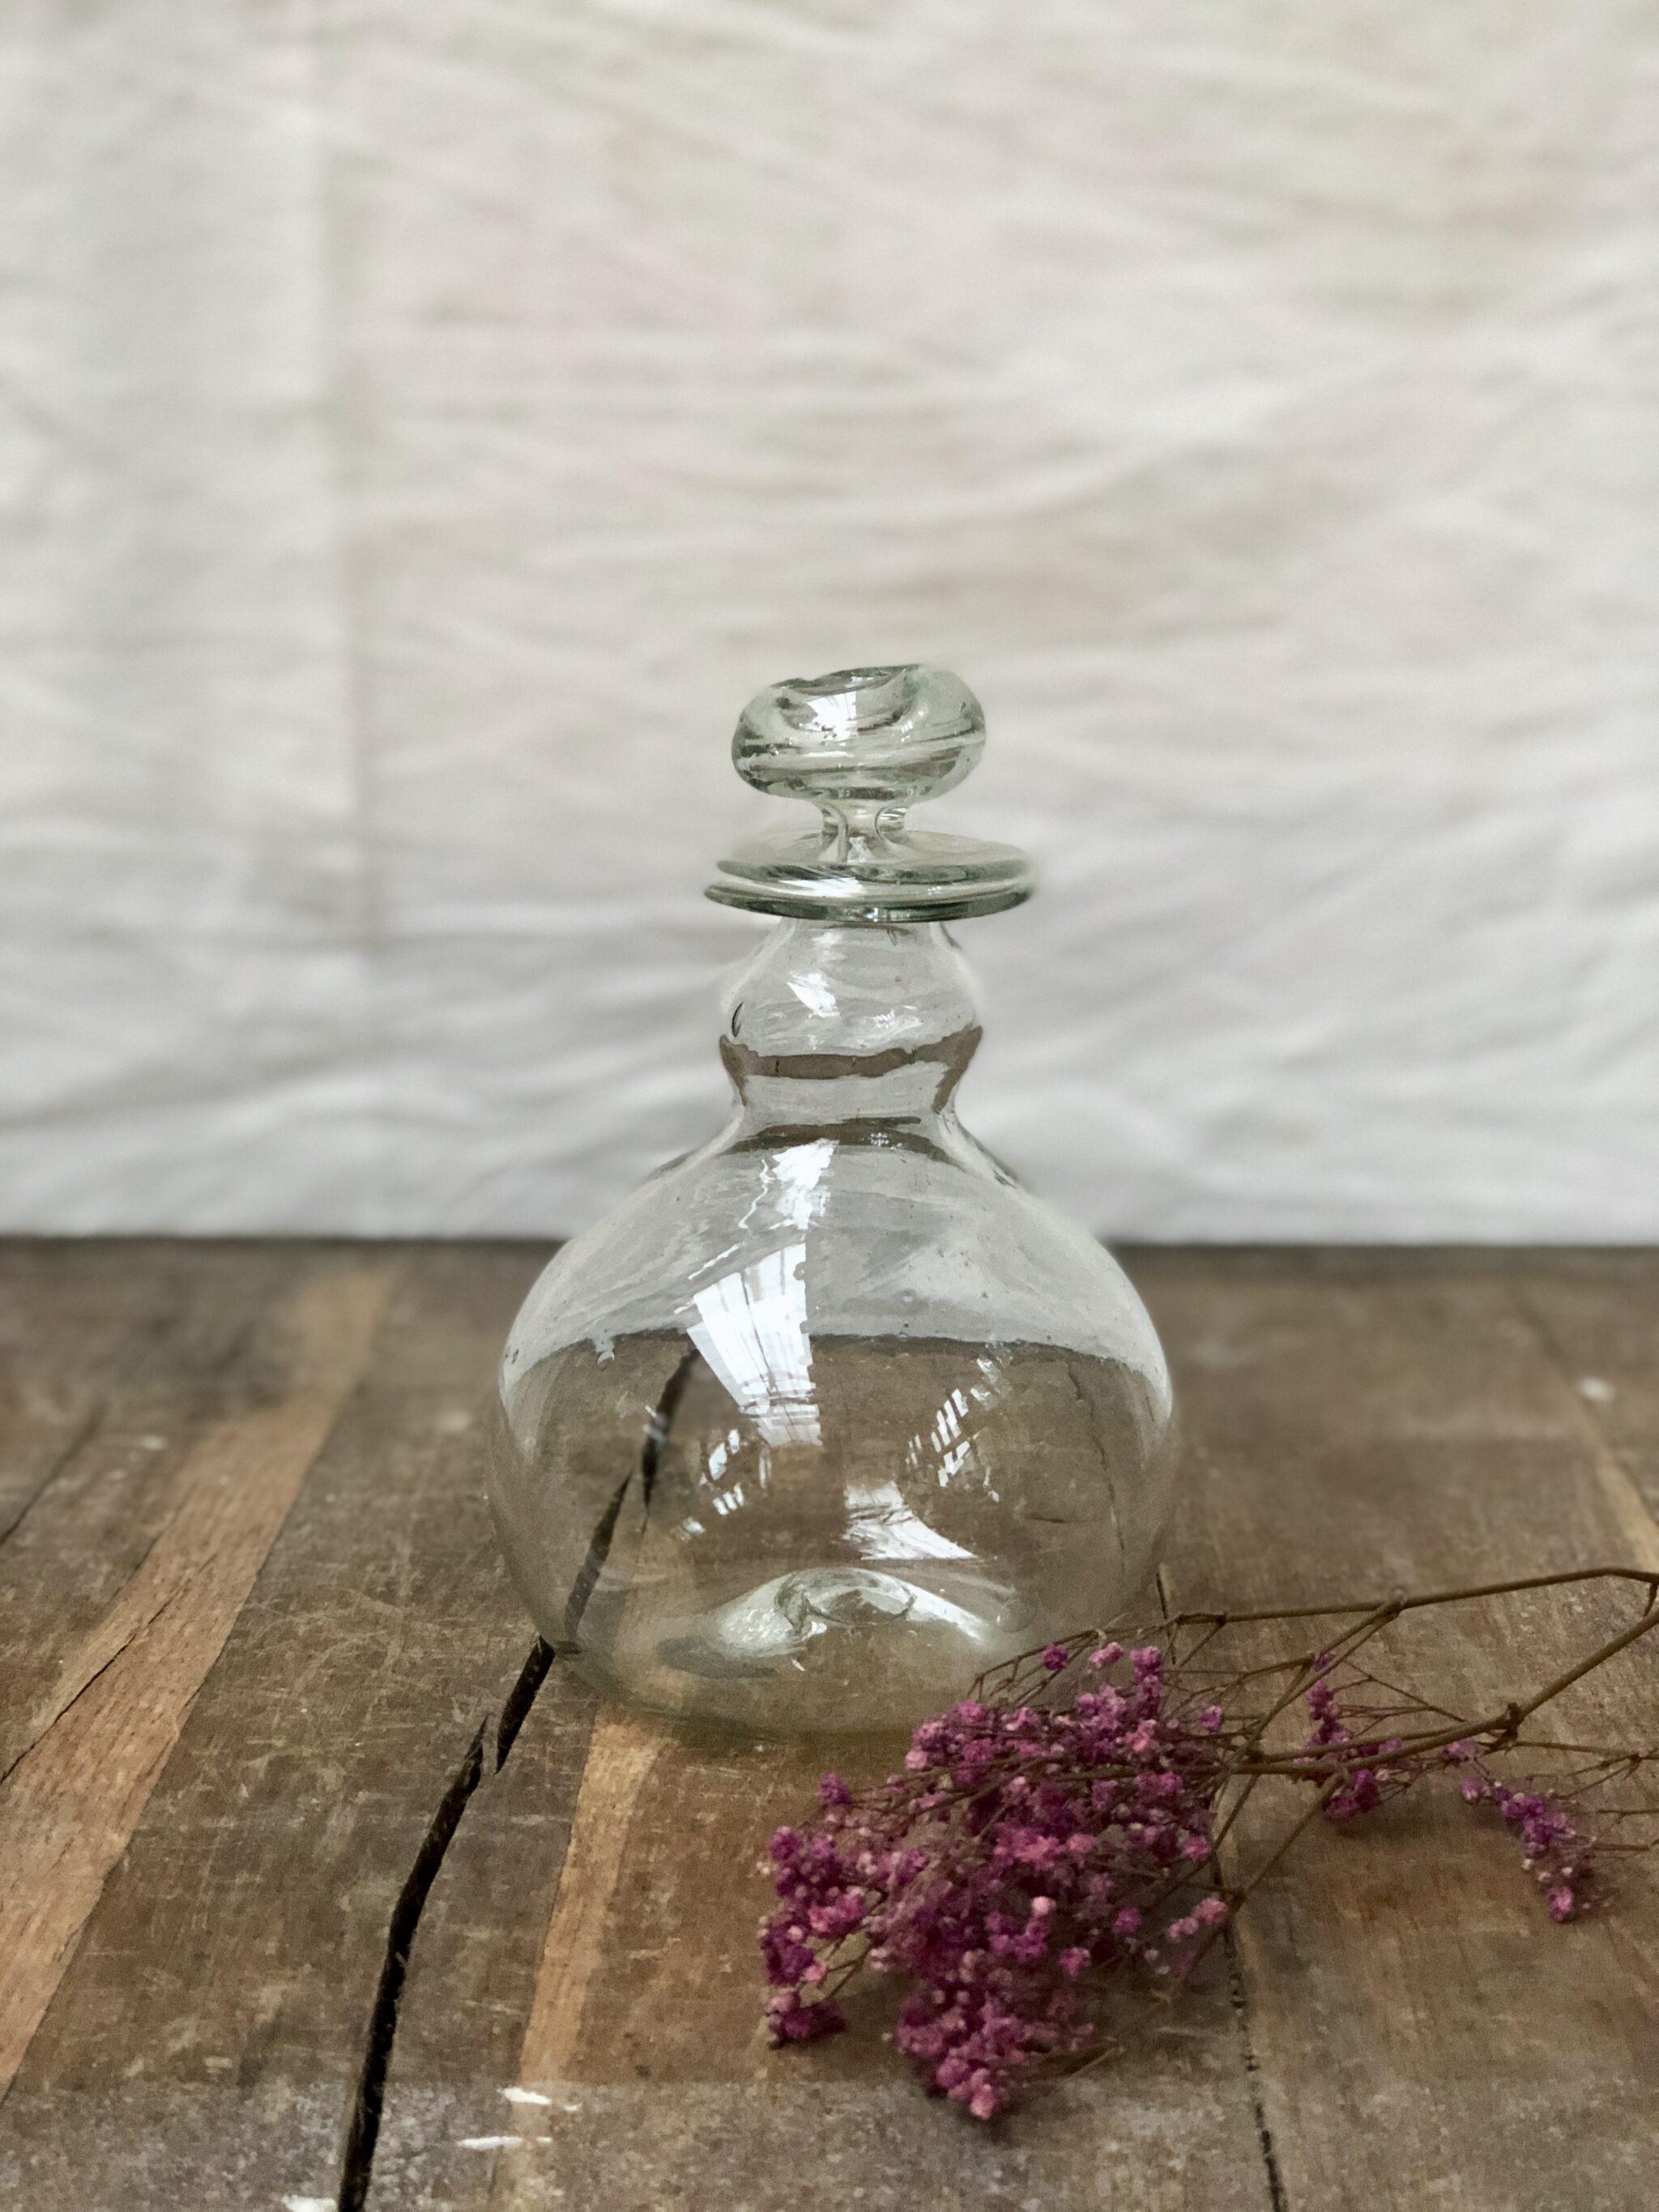 la-soufflerie-cerro-vase-candlestick-holder-transparent-hand-blown-recycled-glass